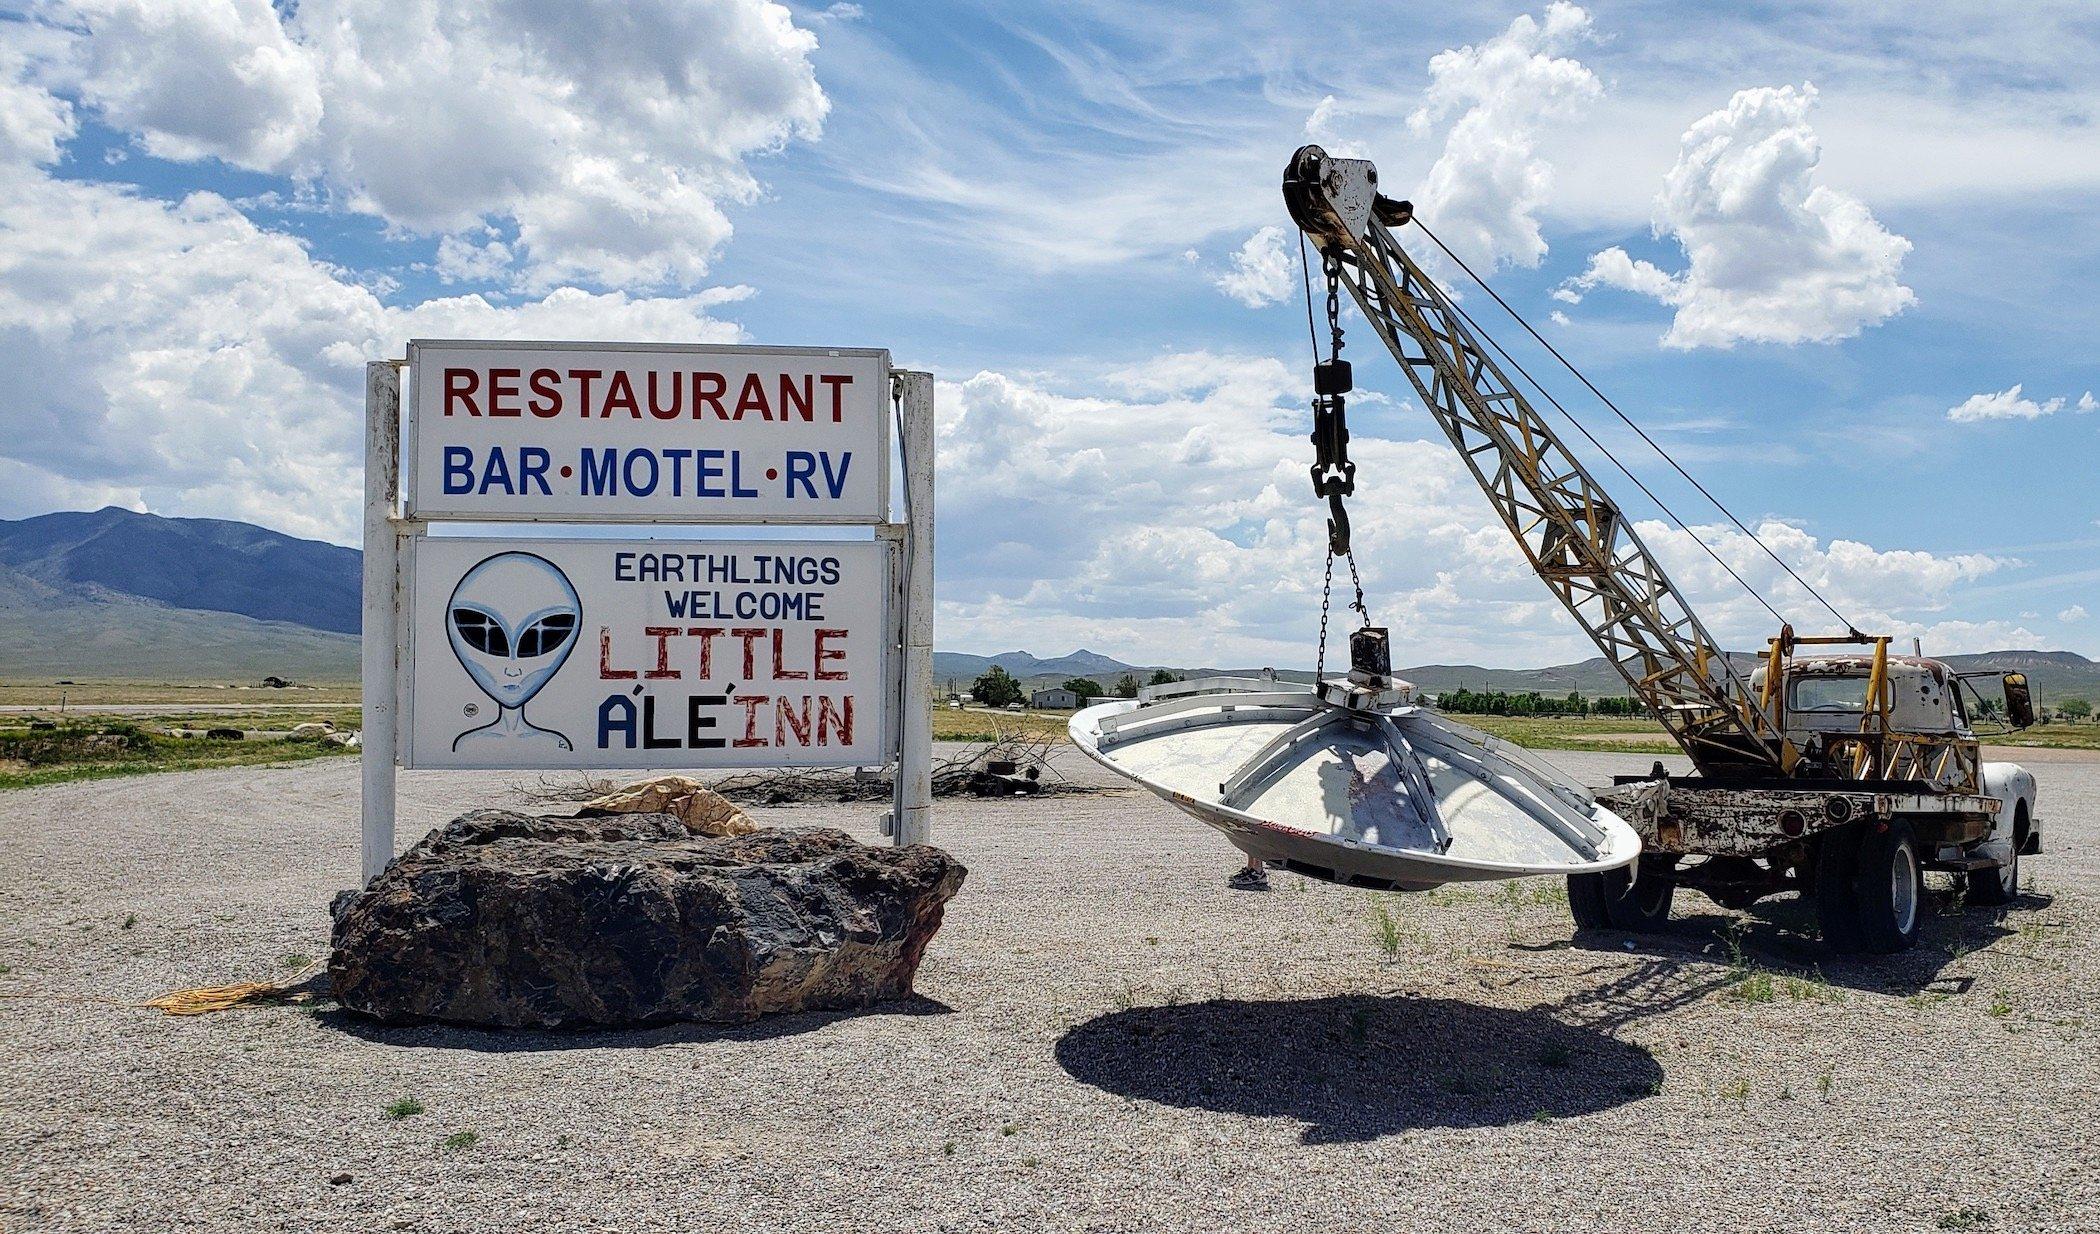 Area 51 Tours From Las Vegas Out West Adventure Tours